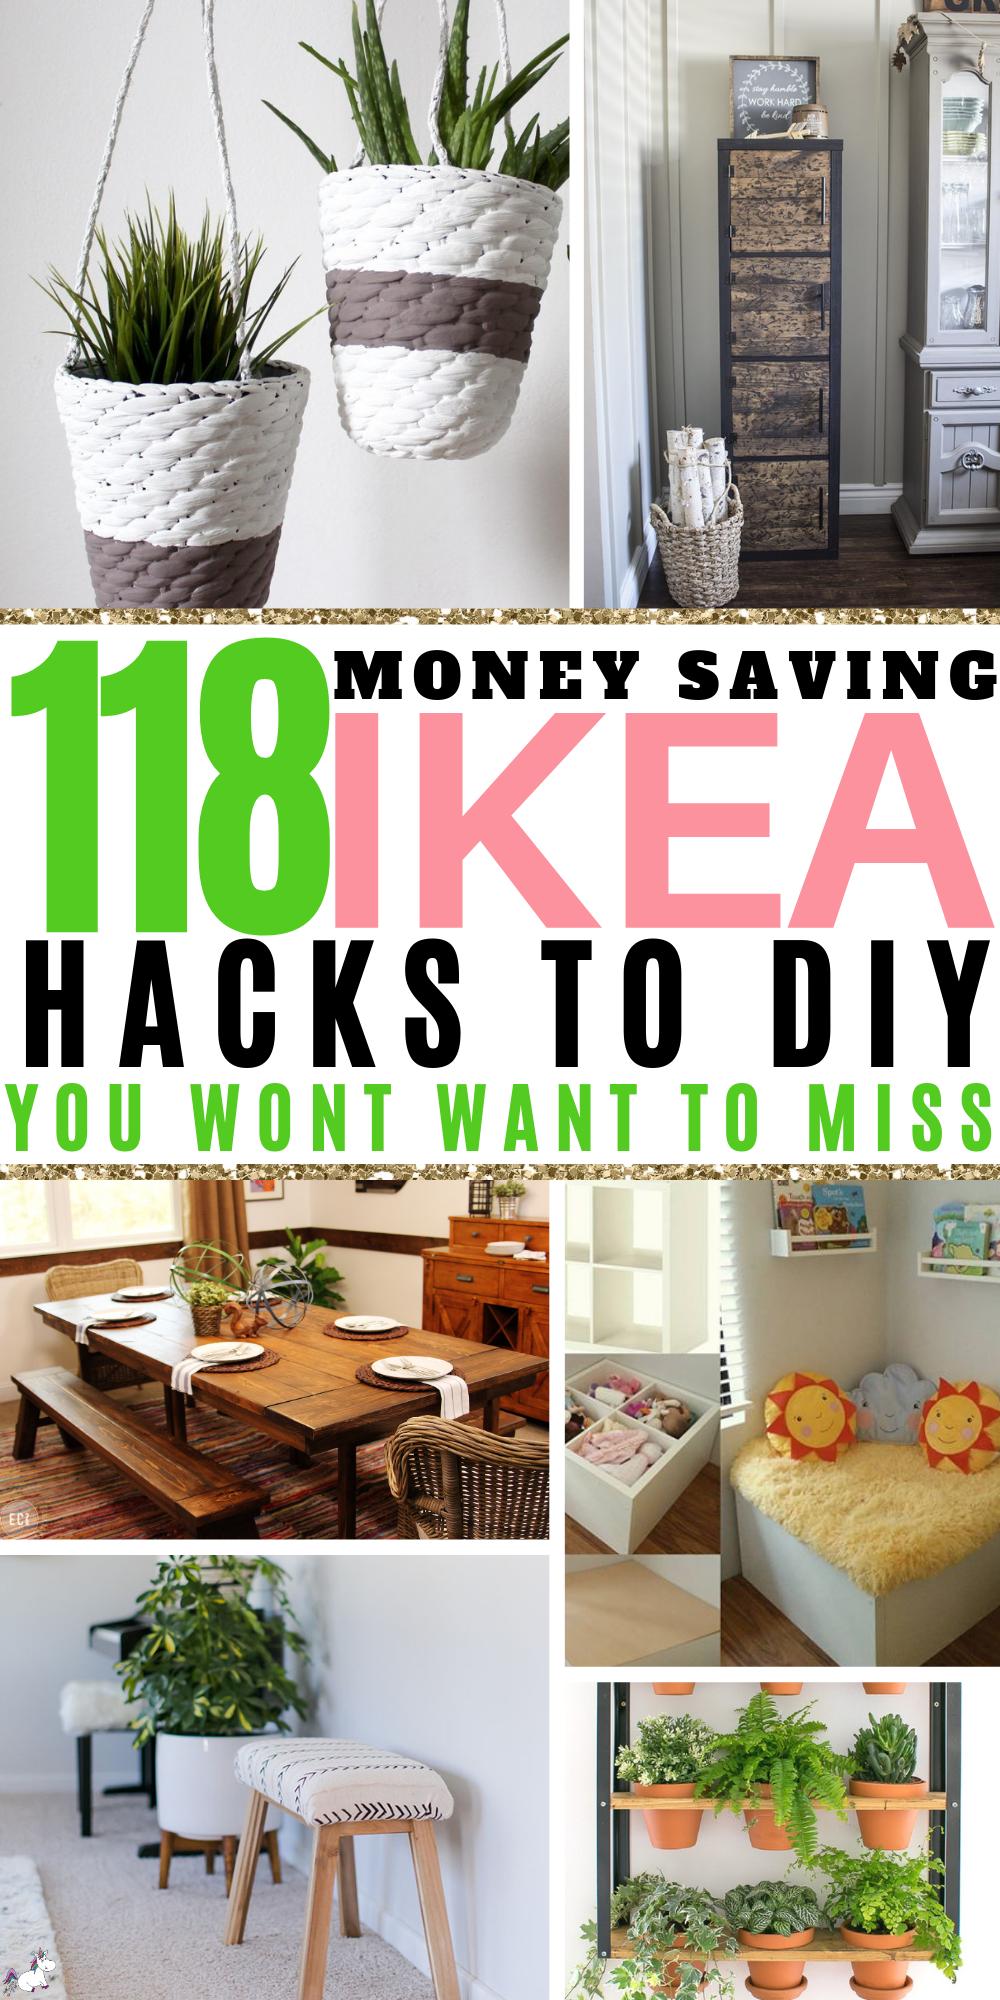 128 Best IKEA Hacks You Shouldn't Miss [Updated 2019 w 2019